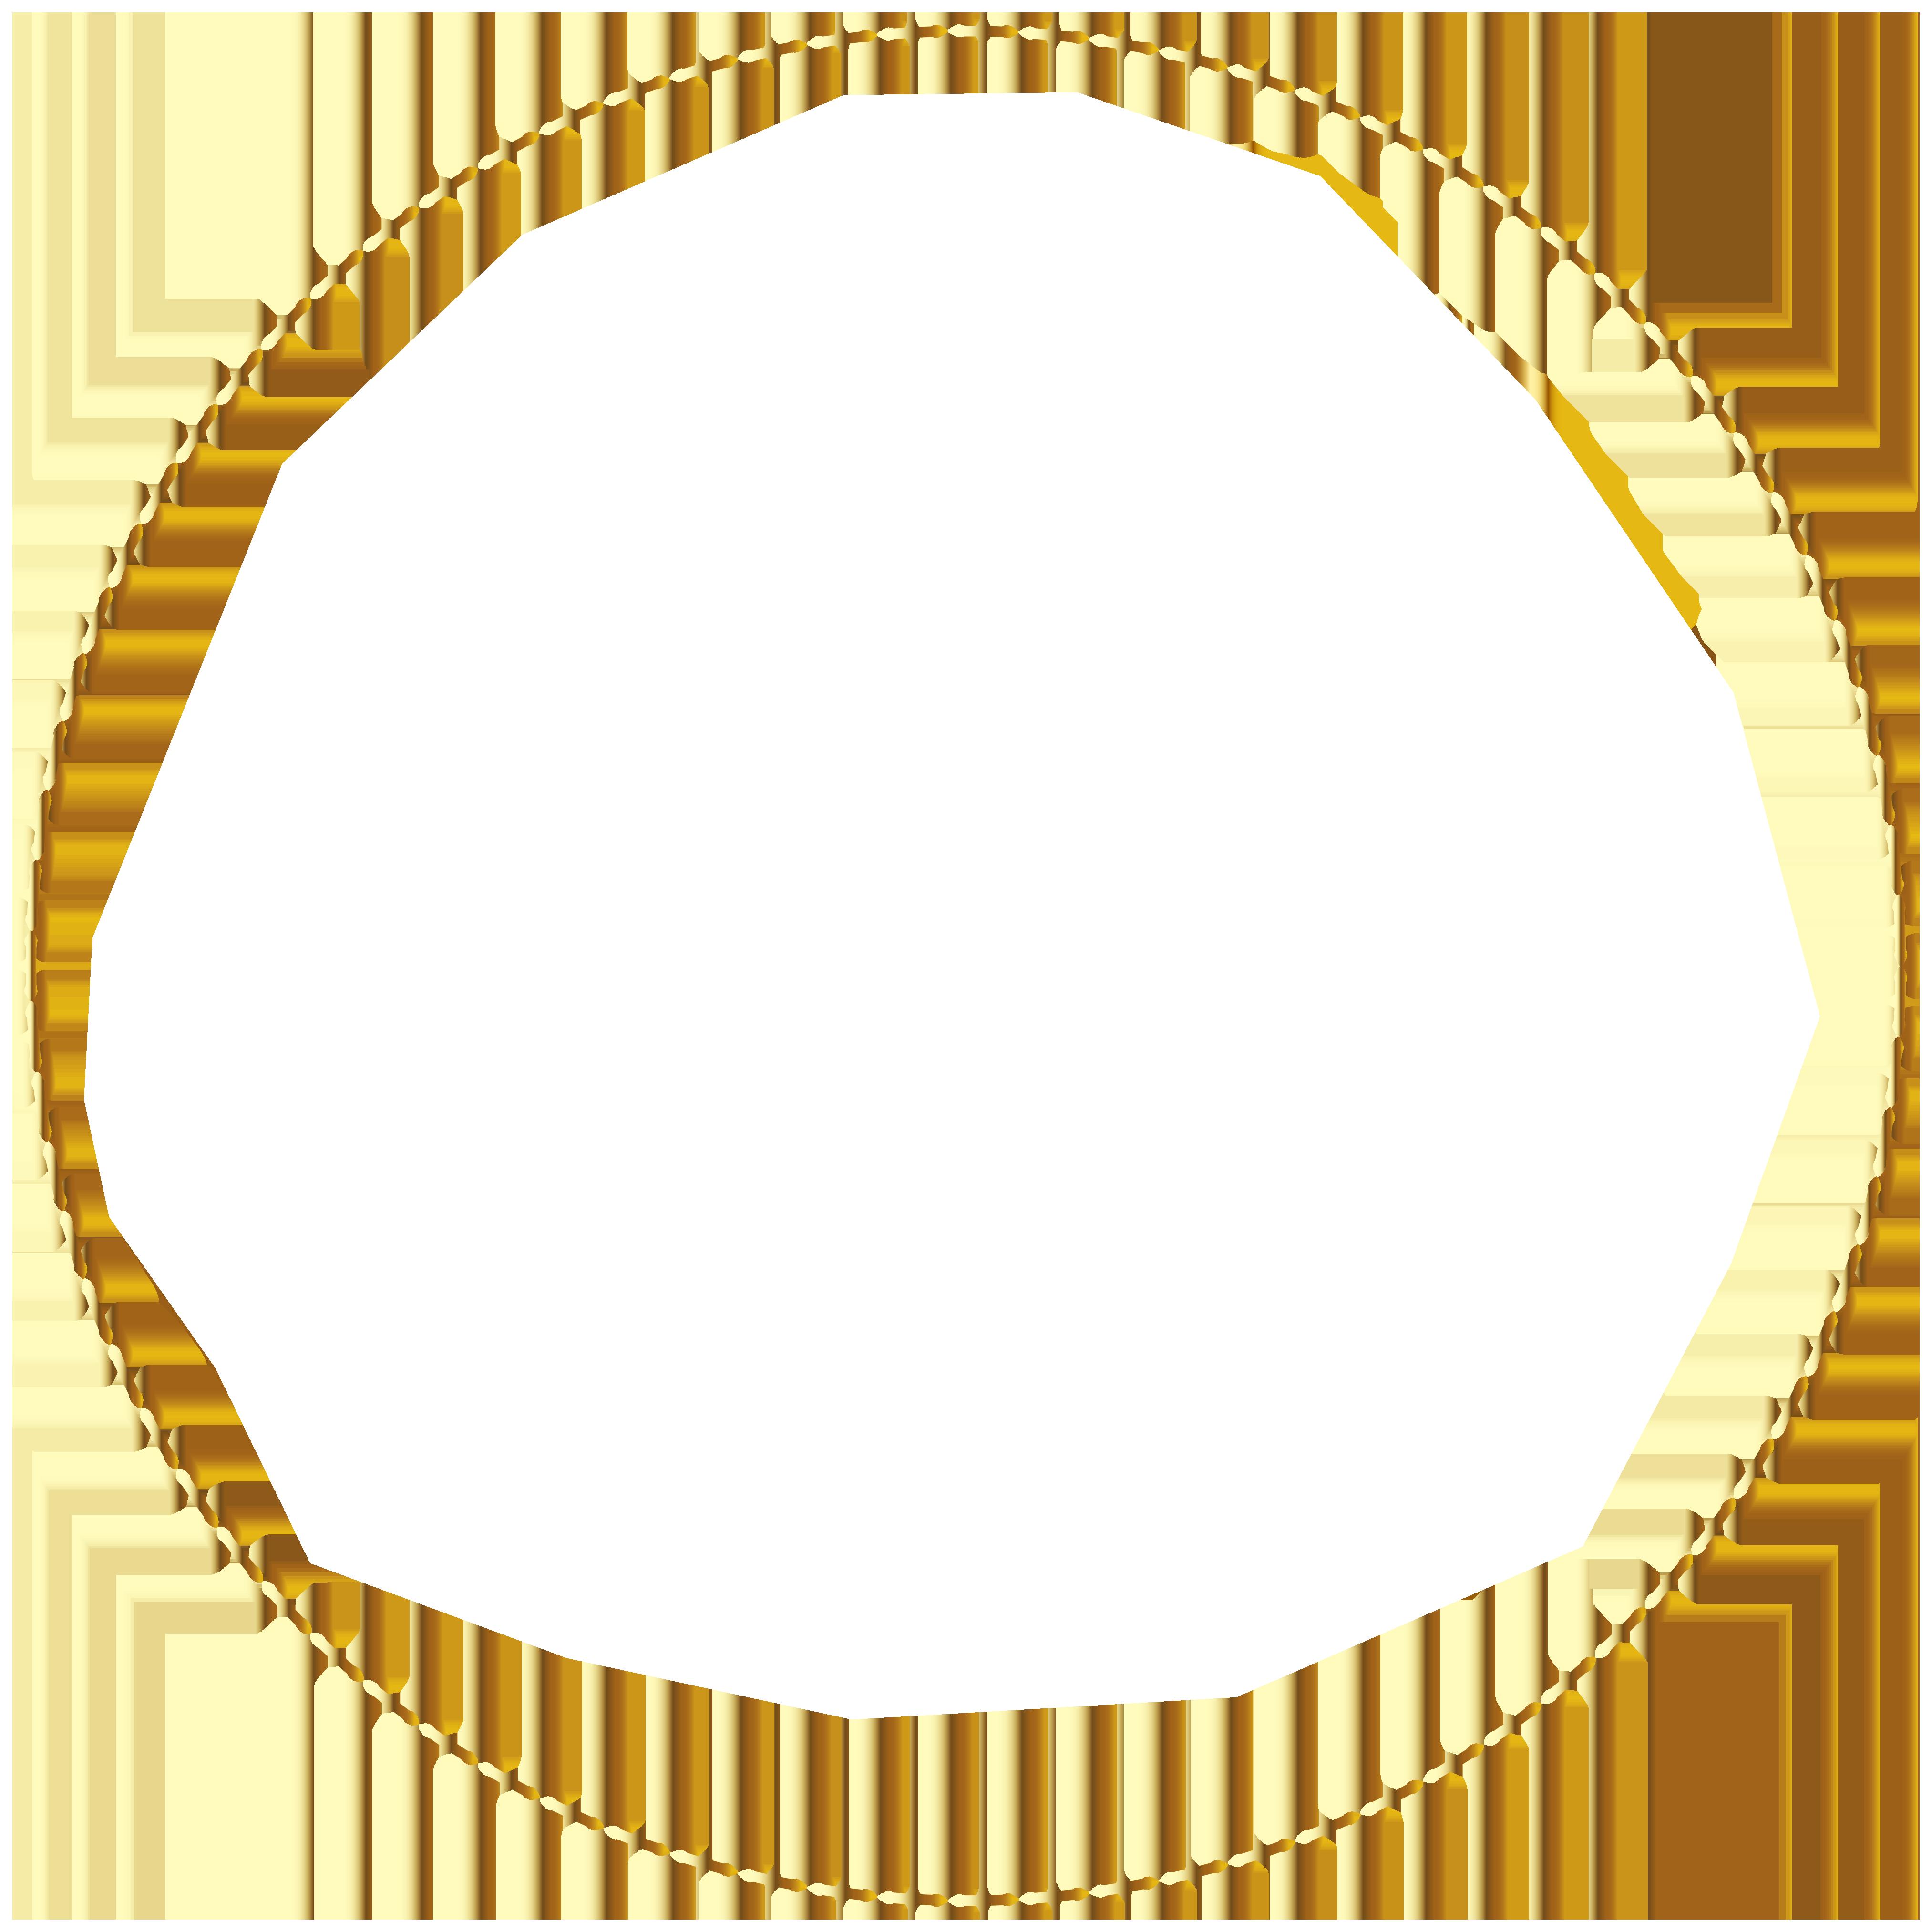 Border frame transparent png. Necklace clipart round gold